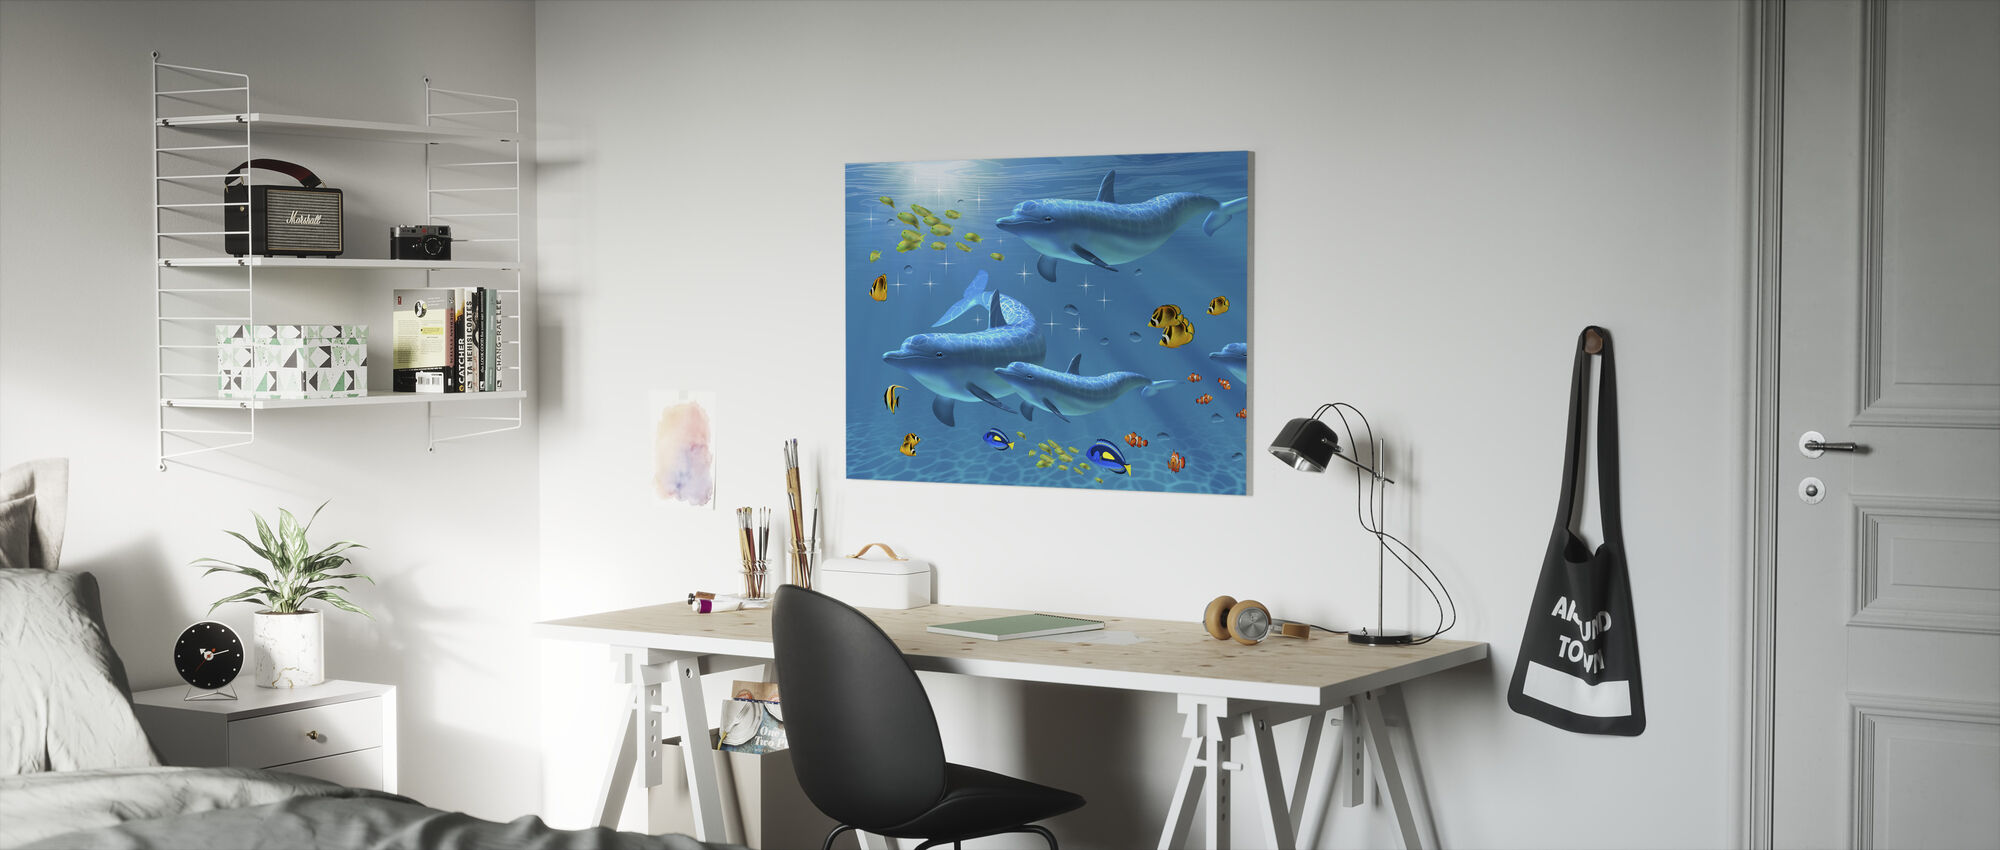 Värin sateenkaari - Canvastaulu - Lastenhuone